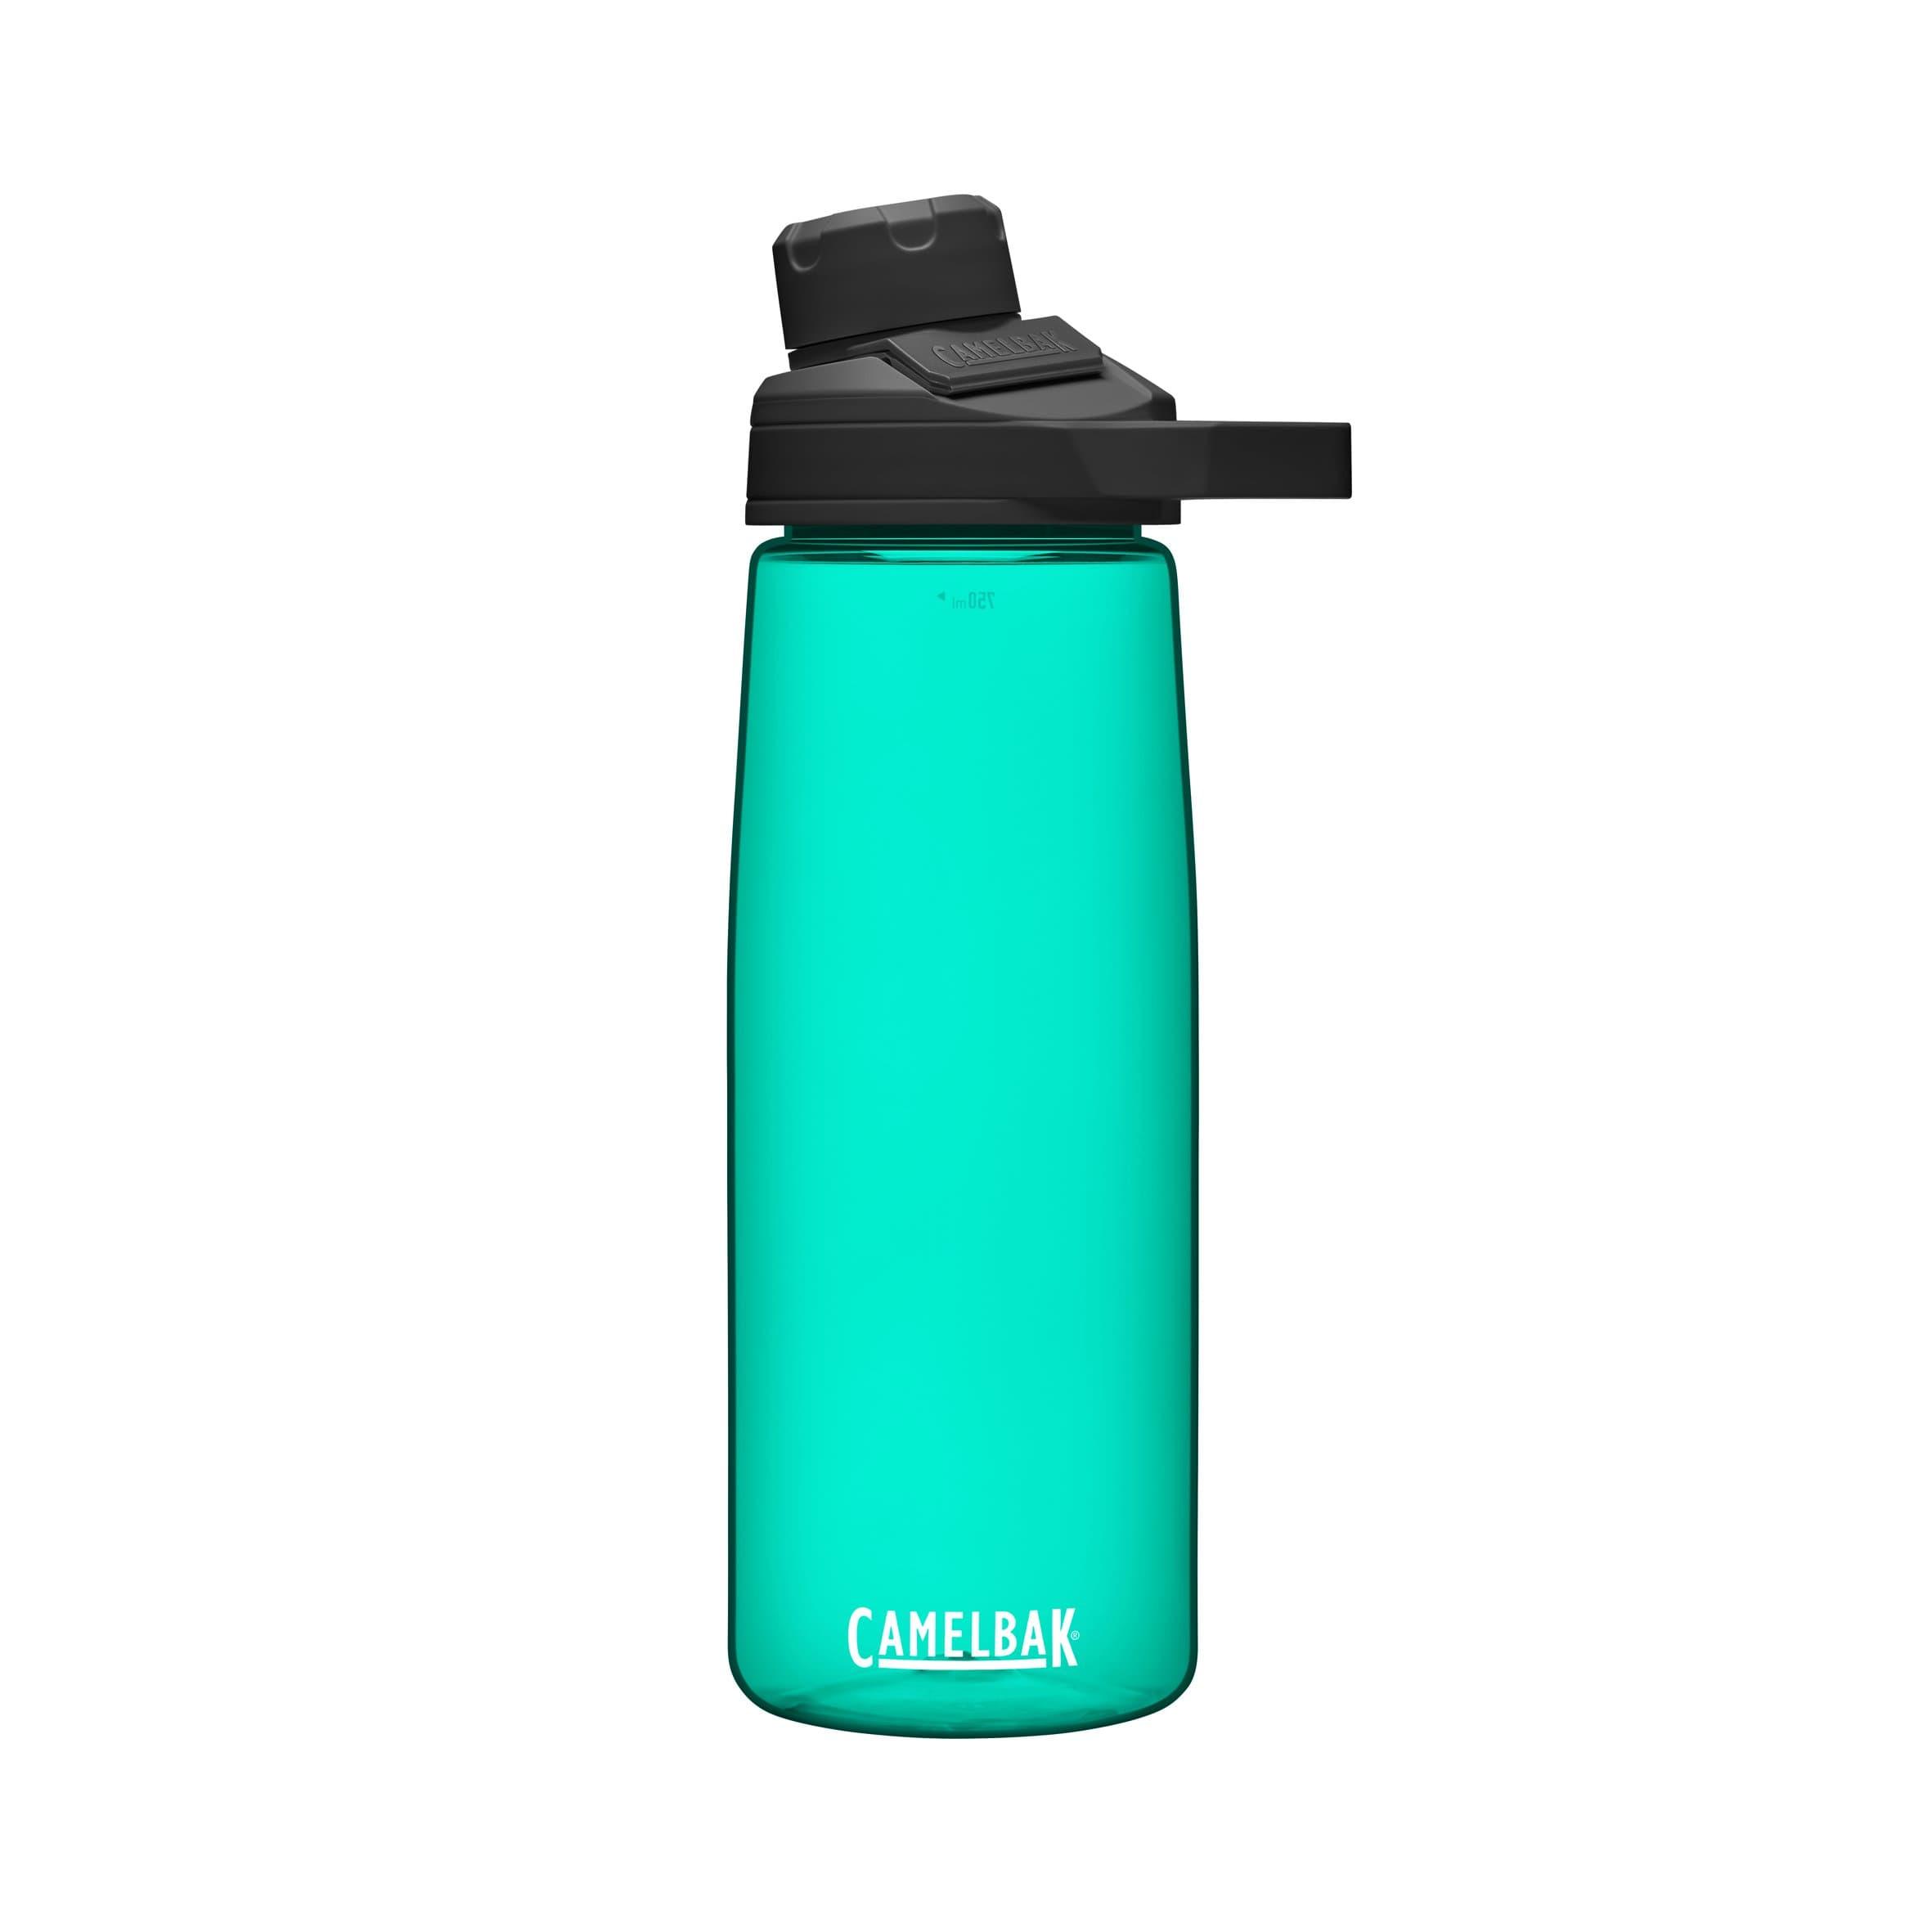 Camelbak Chute Mag Bottle 0.75 Trinkflasche